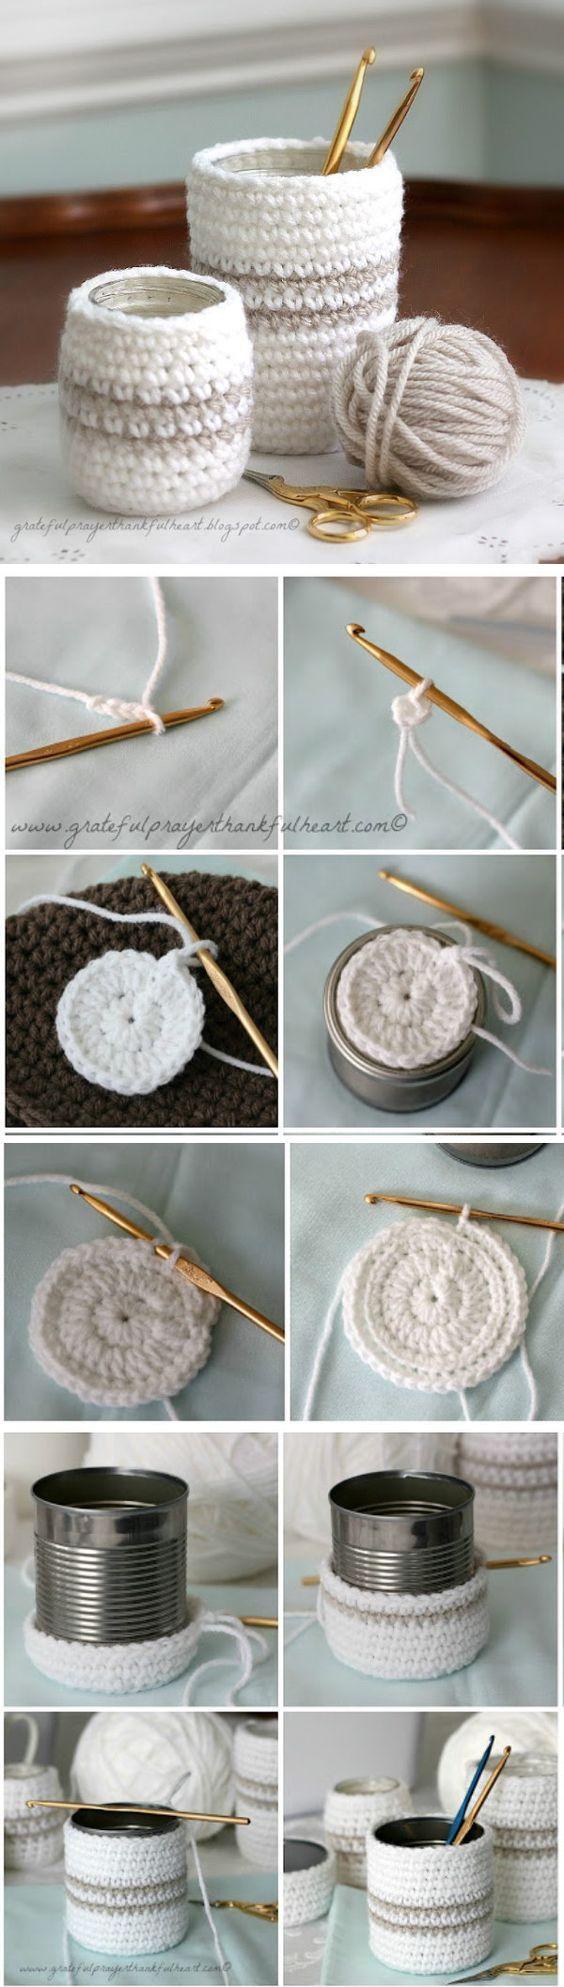 Crochet Cozy for Jars or Cans ❥ 4U hilariafina http://www.pinterest.com/hilariafina/: